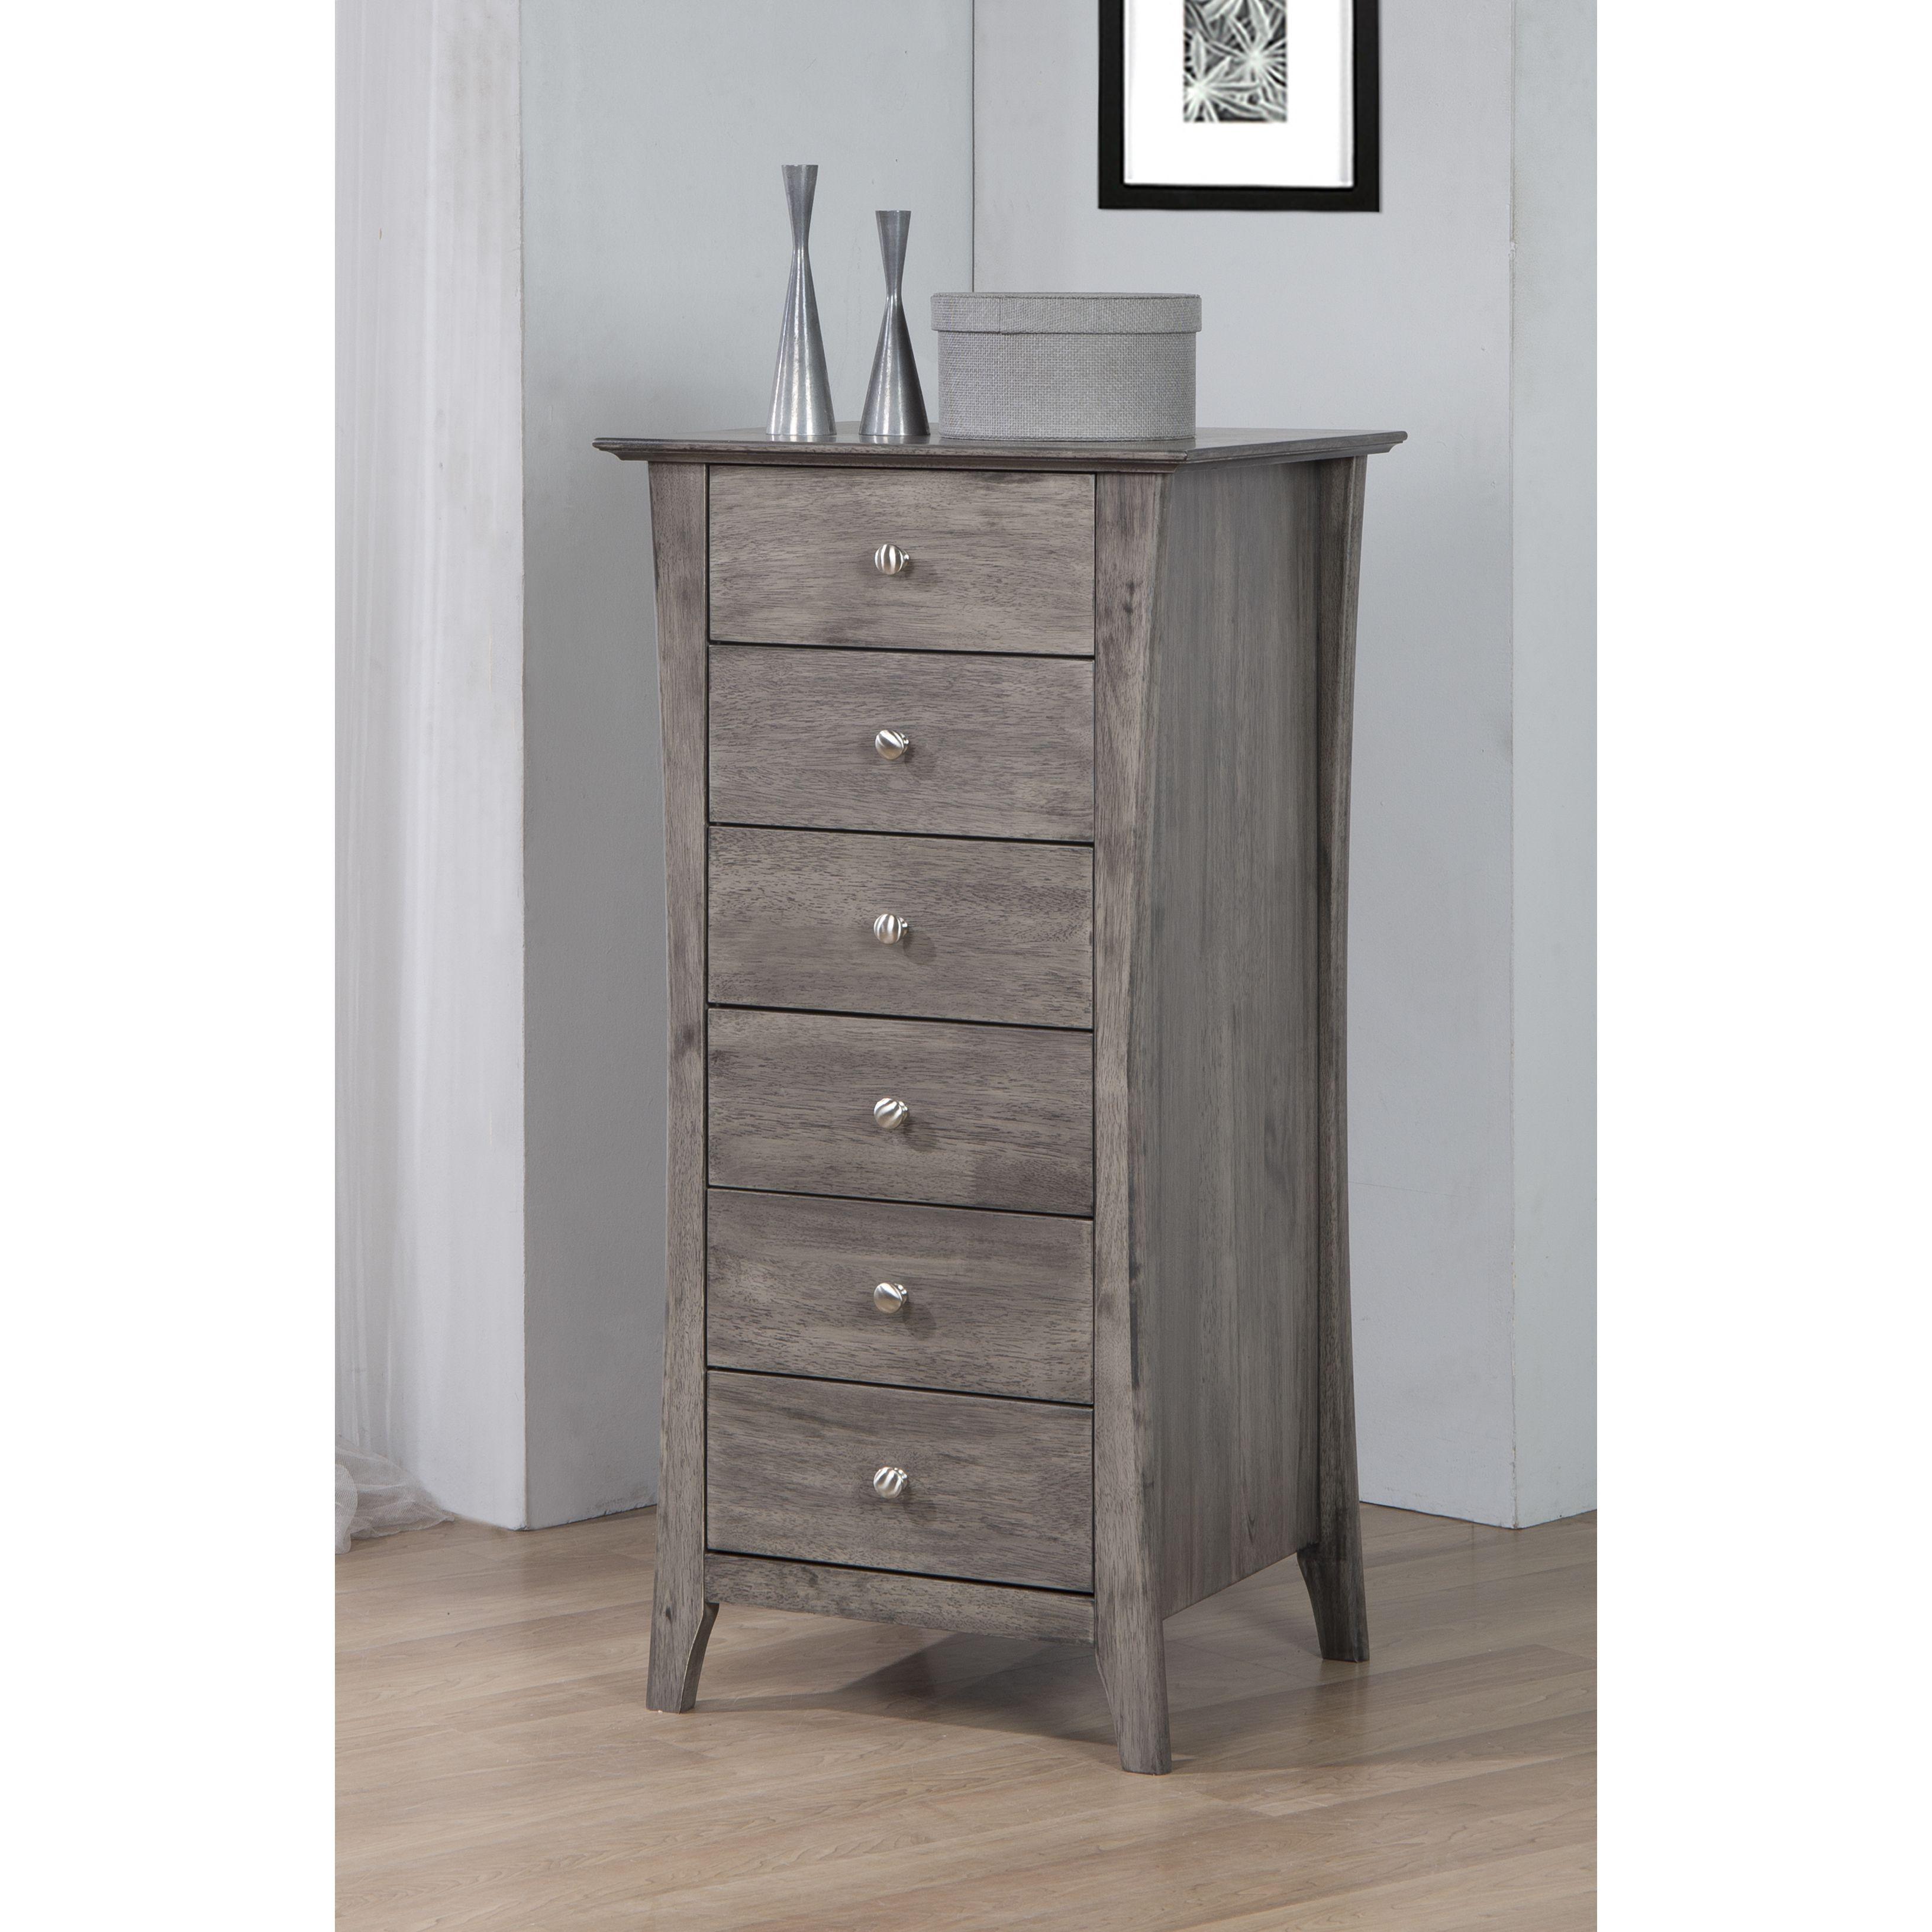 Our Best Bedroom Furniture Deals Burnt Grey Furniture Furniture Of America [ 3265 x 3265 Pixel ]